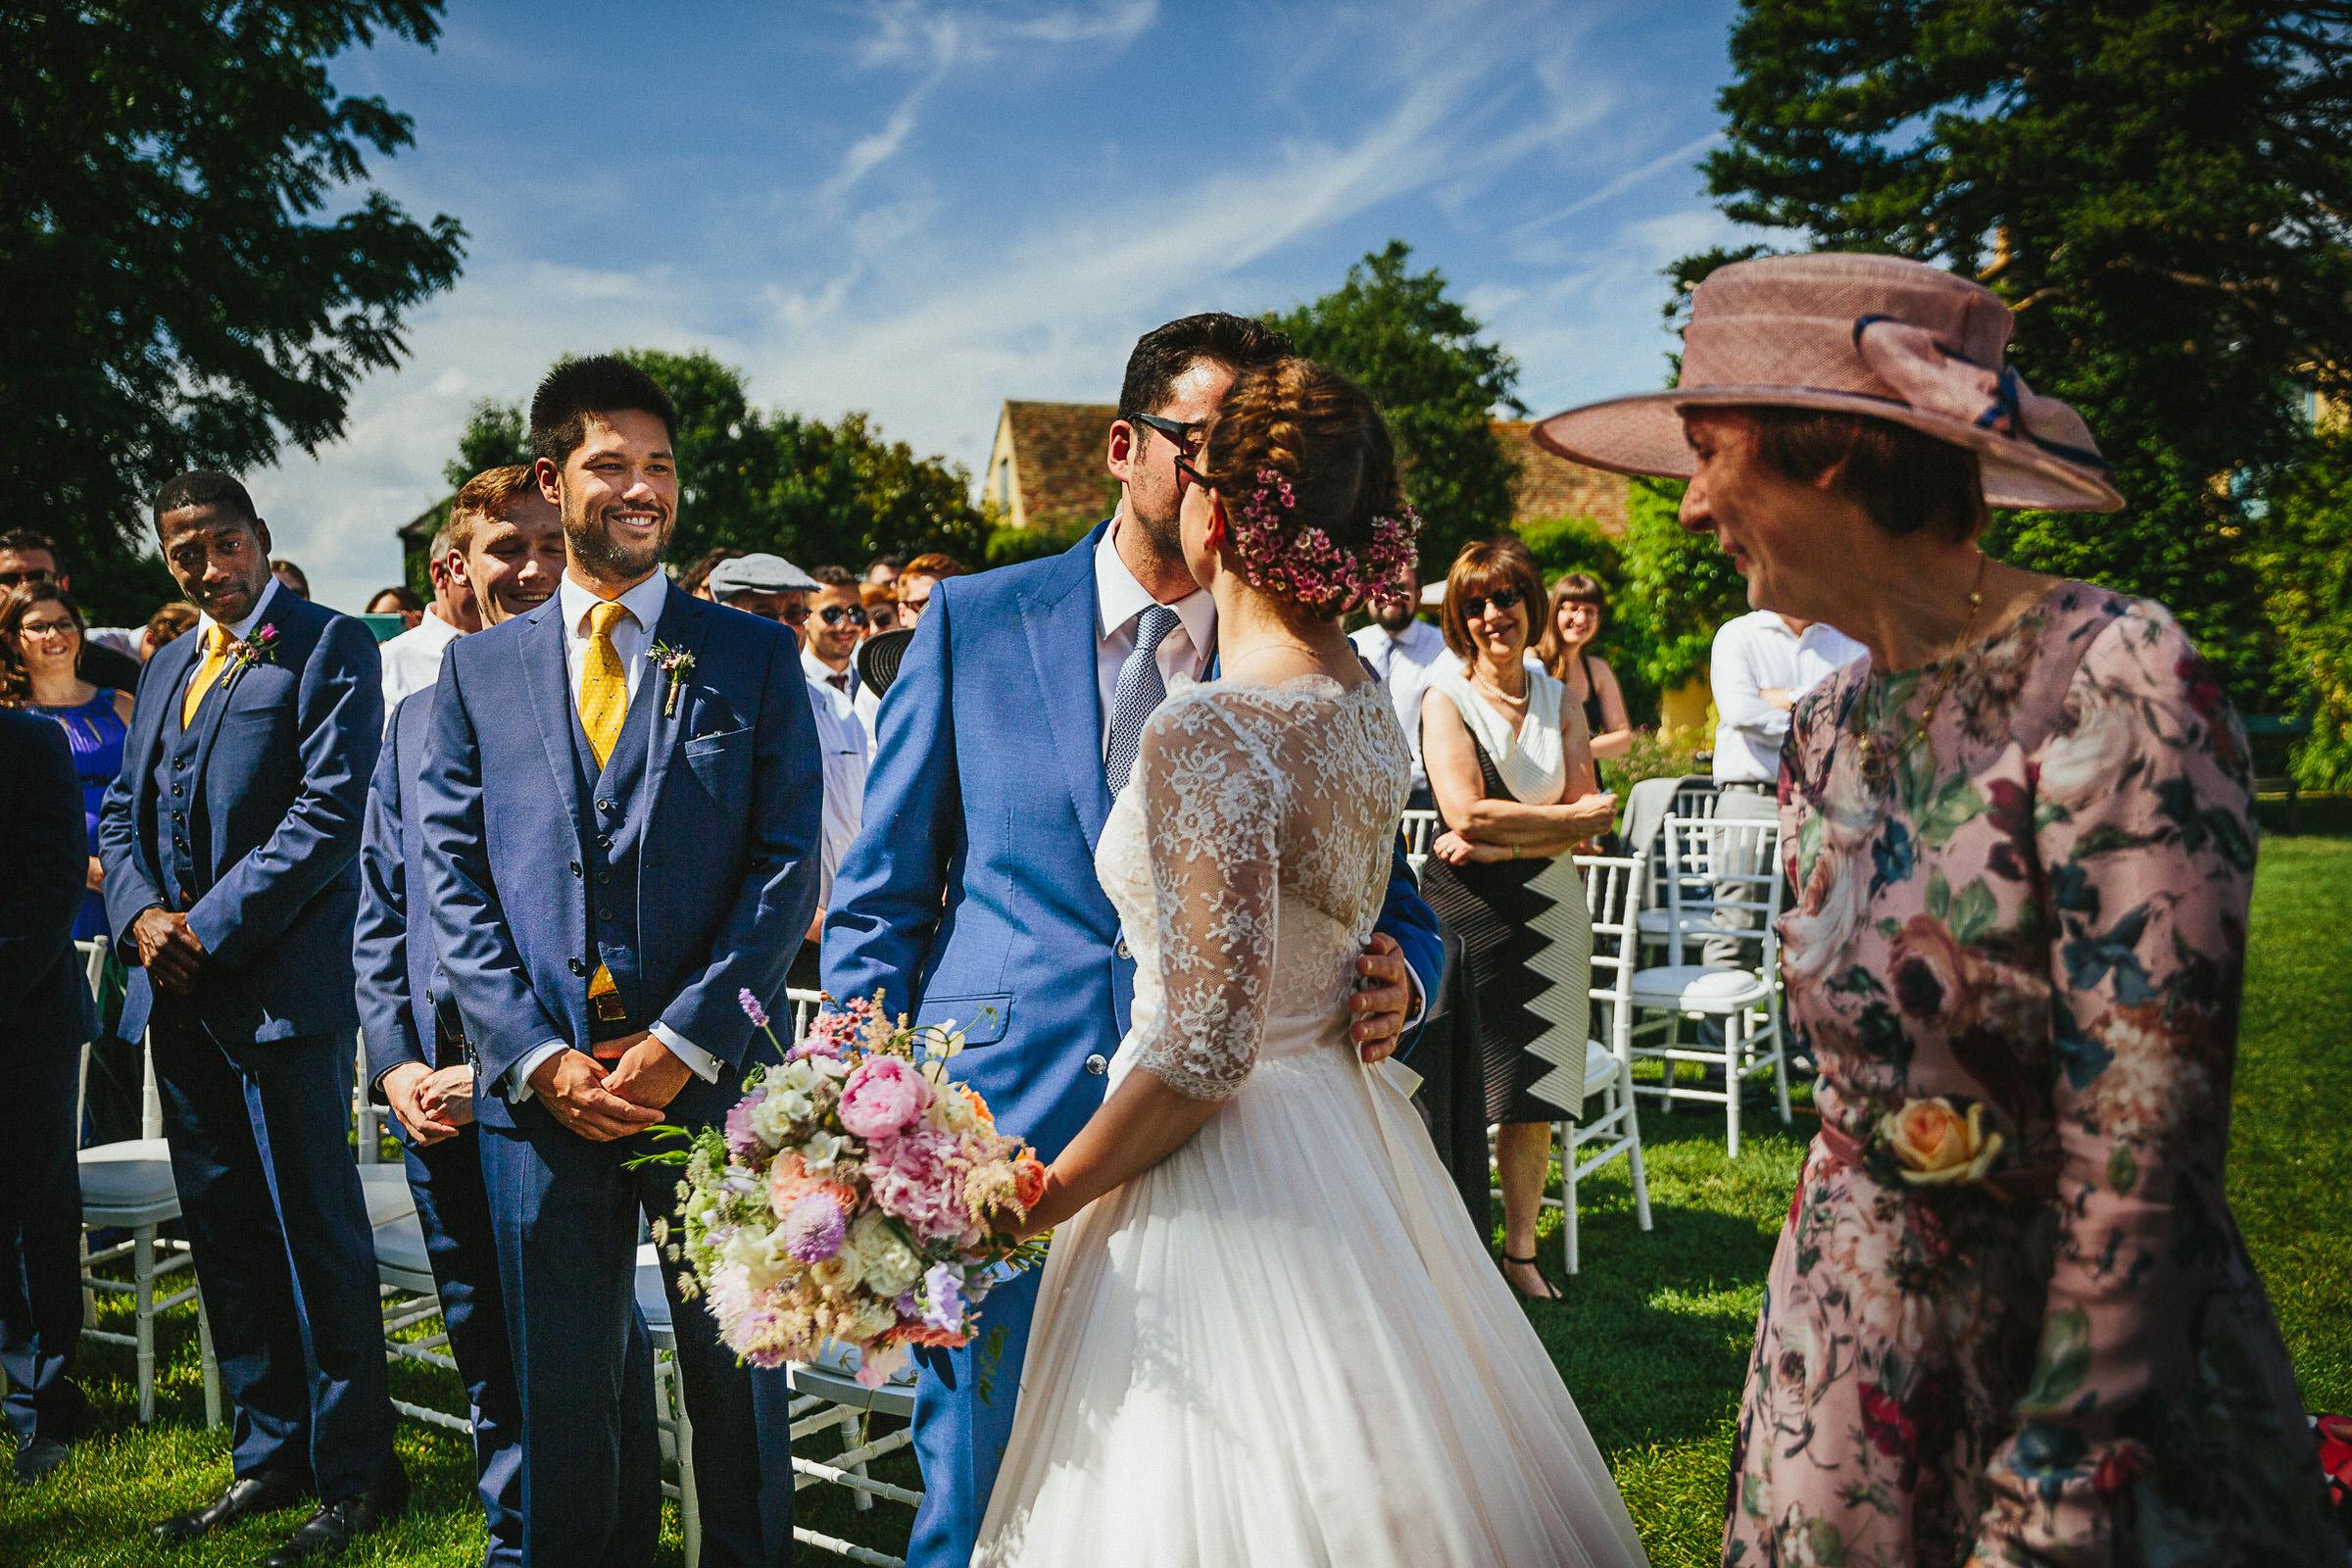 South Farm wedding - Toto & Benji